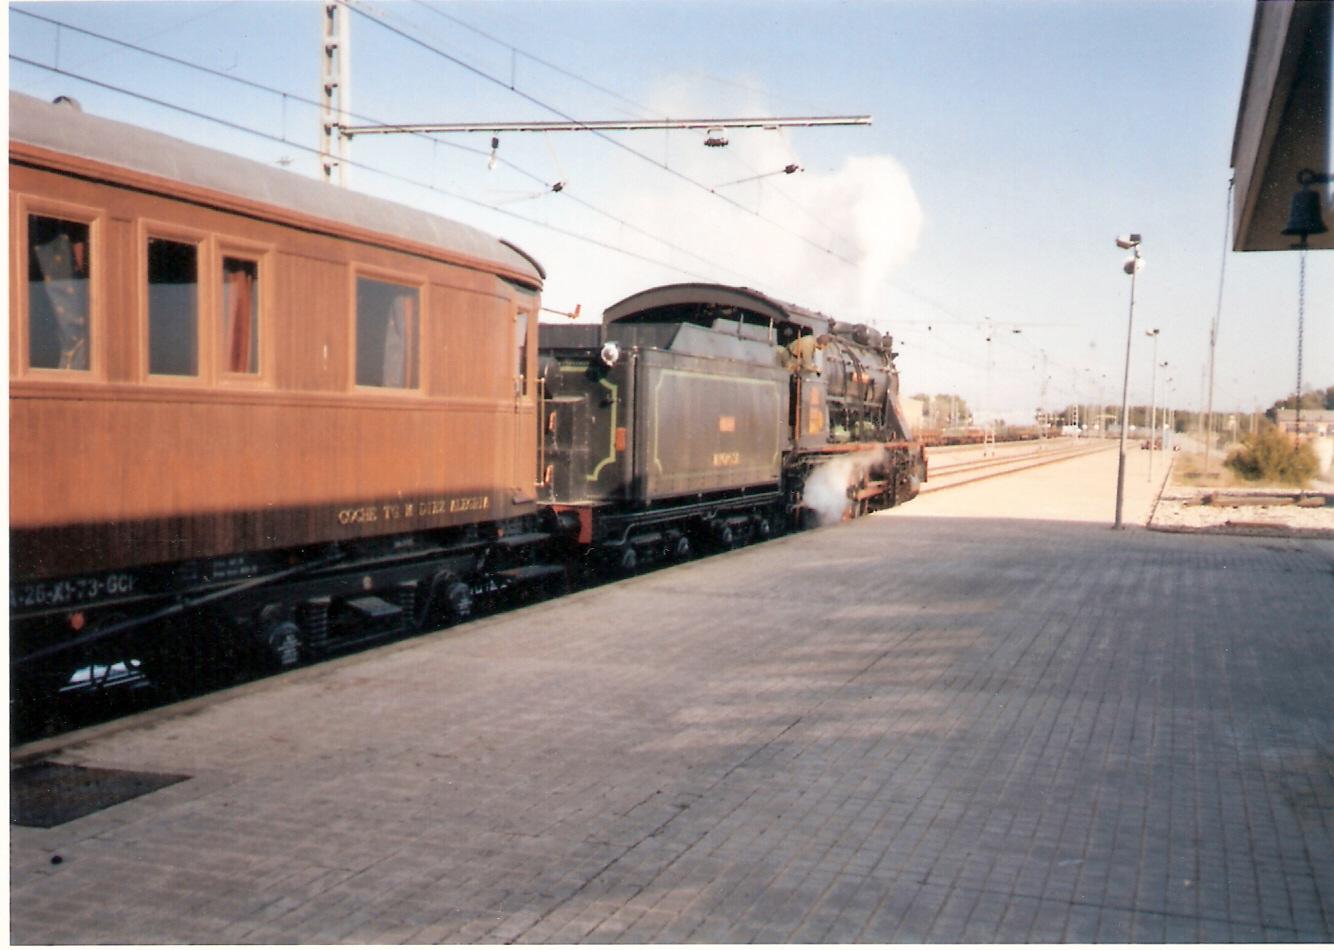 Servicio Militar de Ferrocarriles-Estacion de San Gregorio-Zaragoza 19.11.2003- Gentileza de Francisco González Alcalde